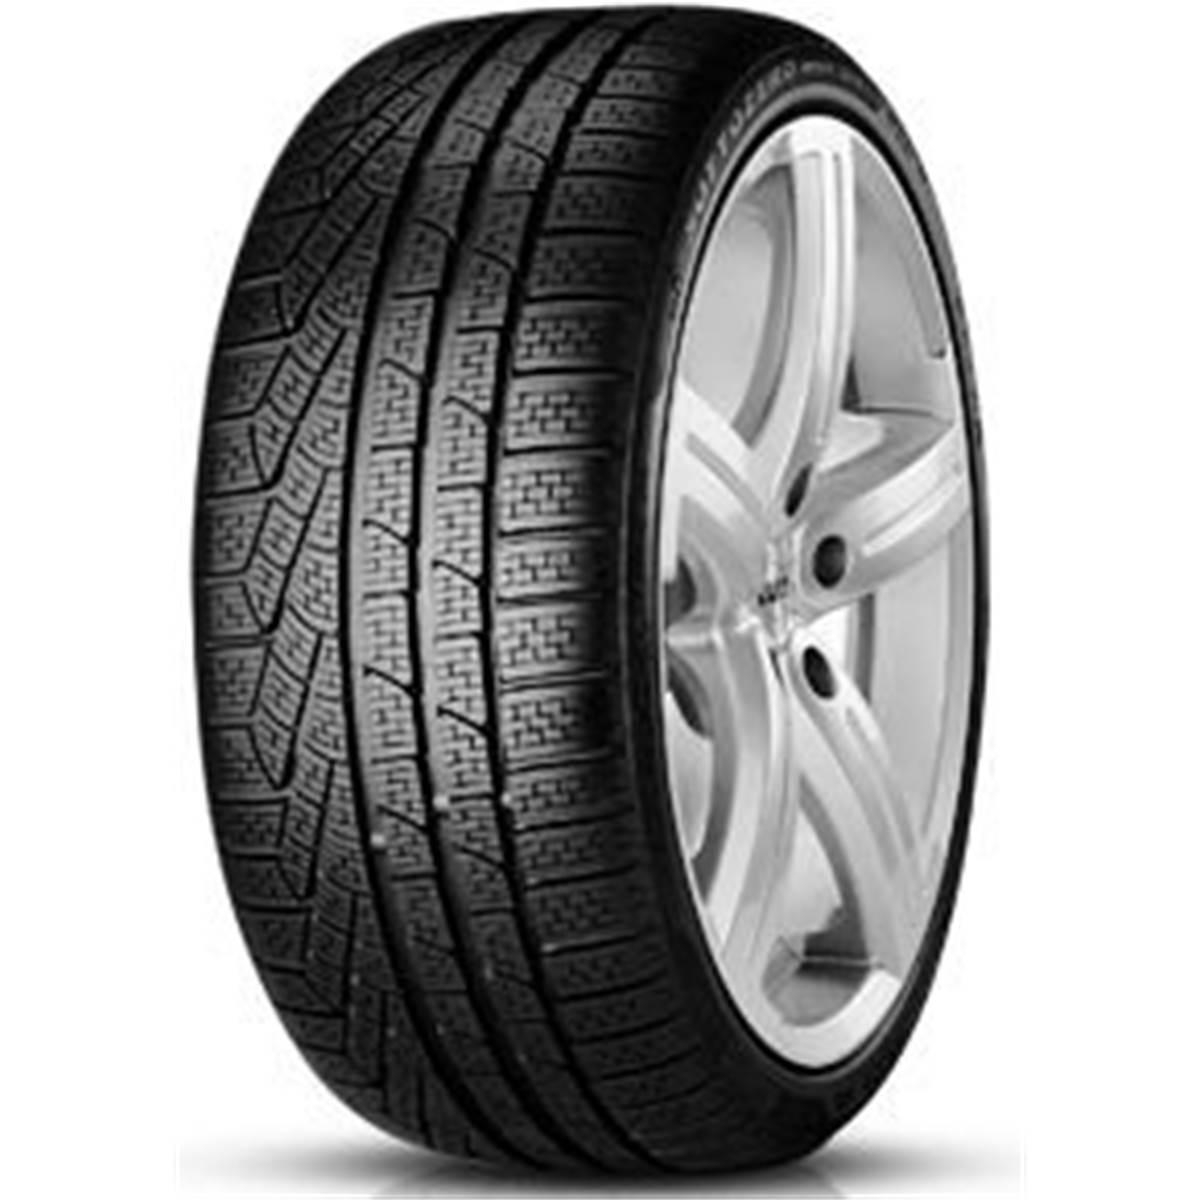 Pirelli Winter 270 Sottozero Serie Ii Homologue Mercedes Xl